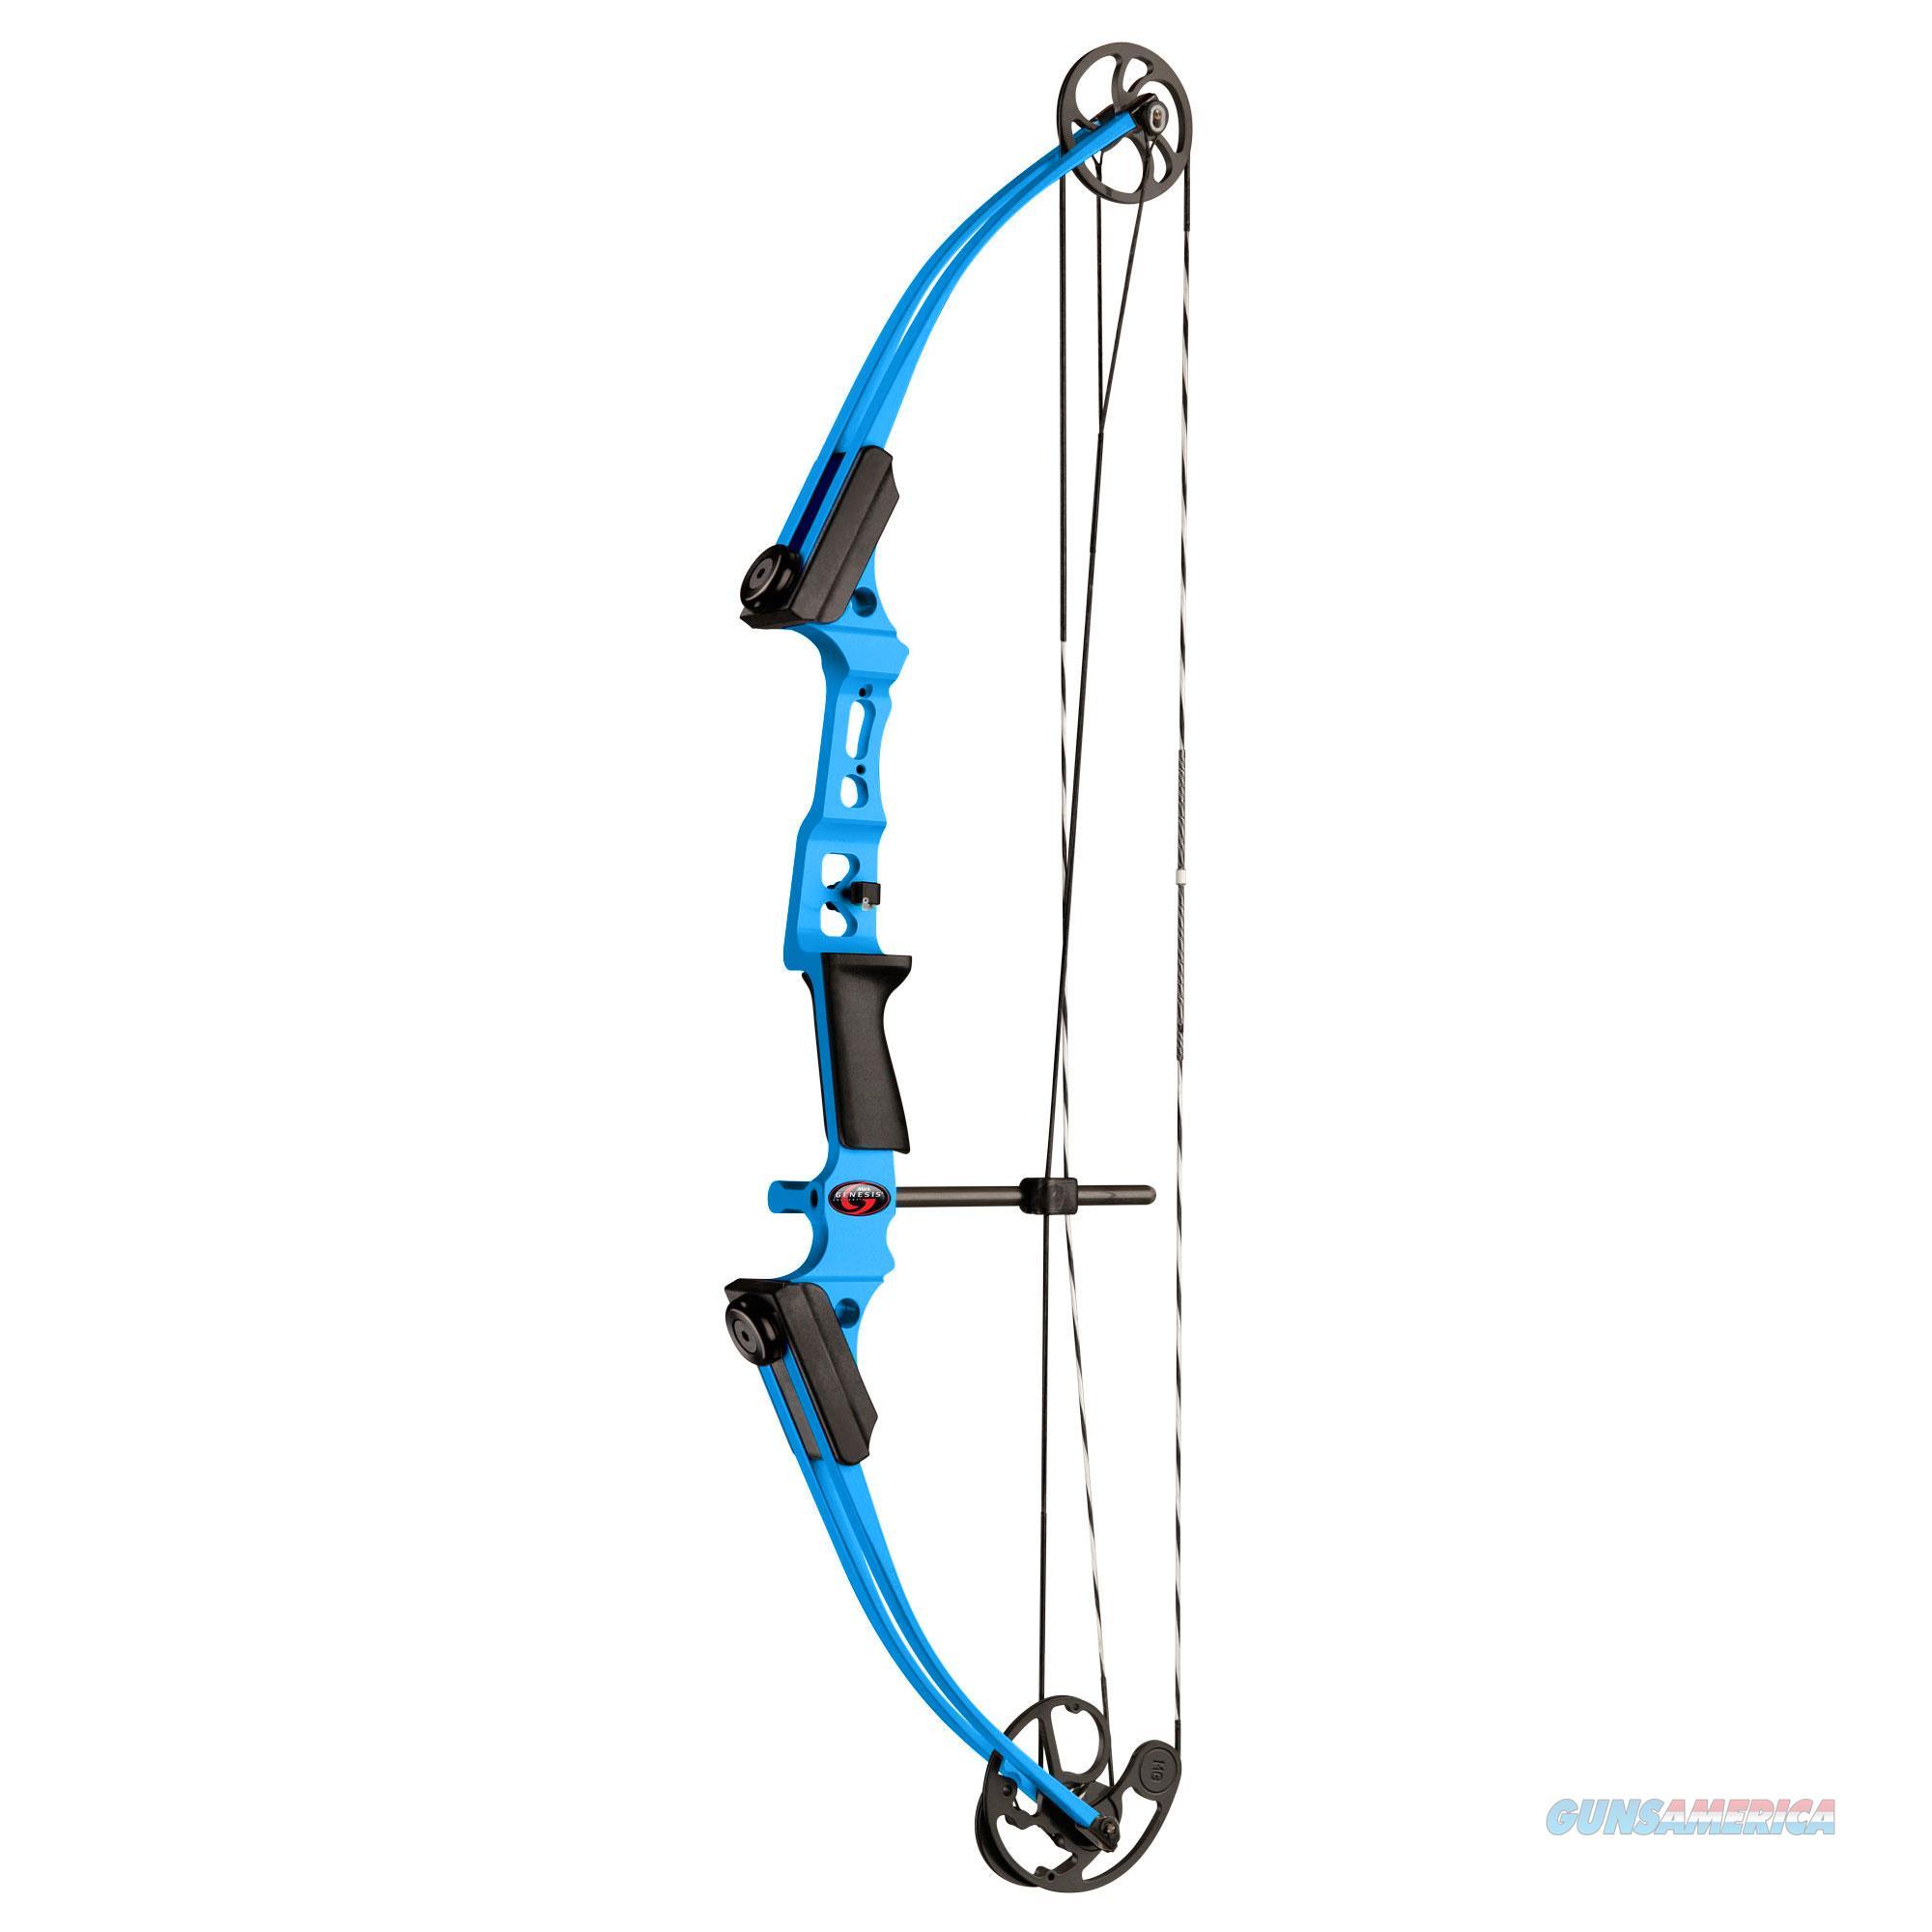 Genesis Mini Bow With Kit 11426  Non-Guns > Archery > Parts